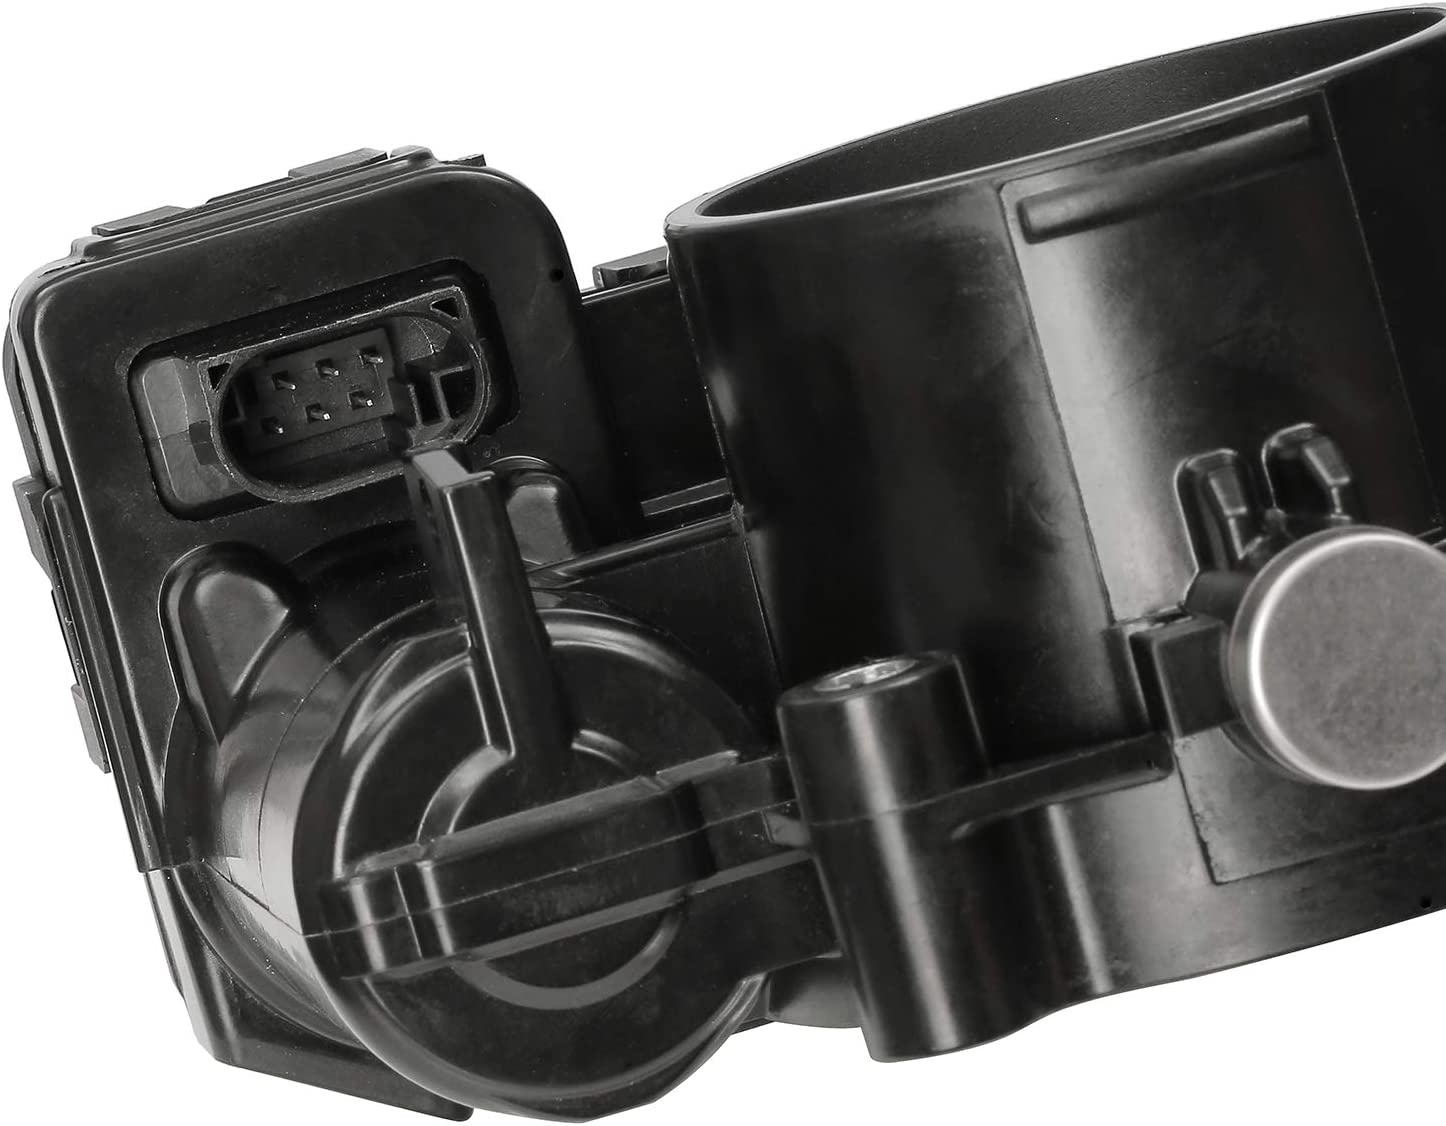 Electronic Throttle Body Assembly with IAC TPS for 2007-2011 Dodge Dakota Durango Nitro Ram 1500 Jeep Commander Grand Cherokee Liberty Mitsubishi Raider 3.7L 3.8L 04861661AB Replace# 04861661AA